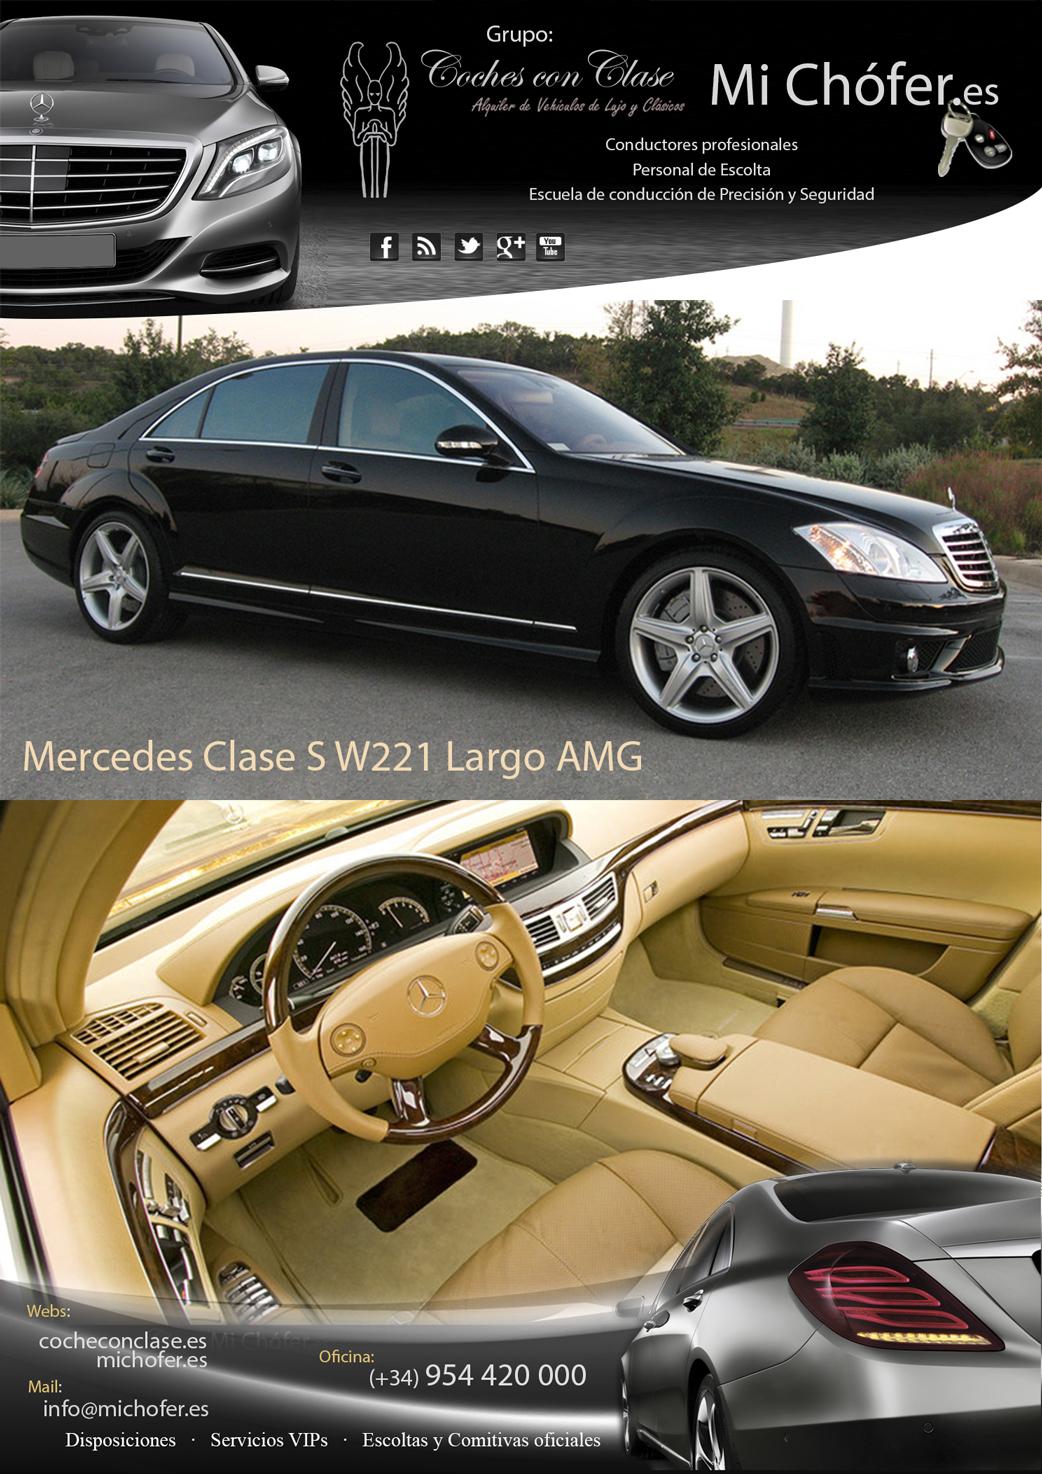 Mercedes-Clase-S-W221-Largo-AMG